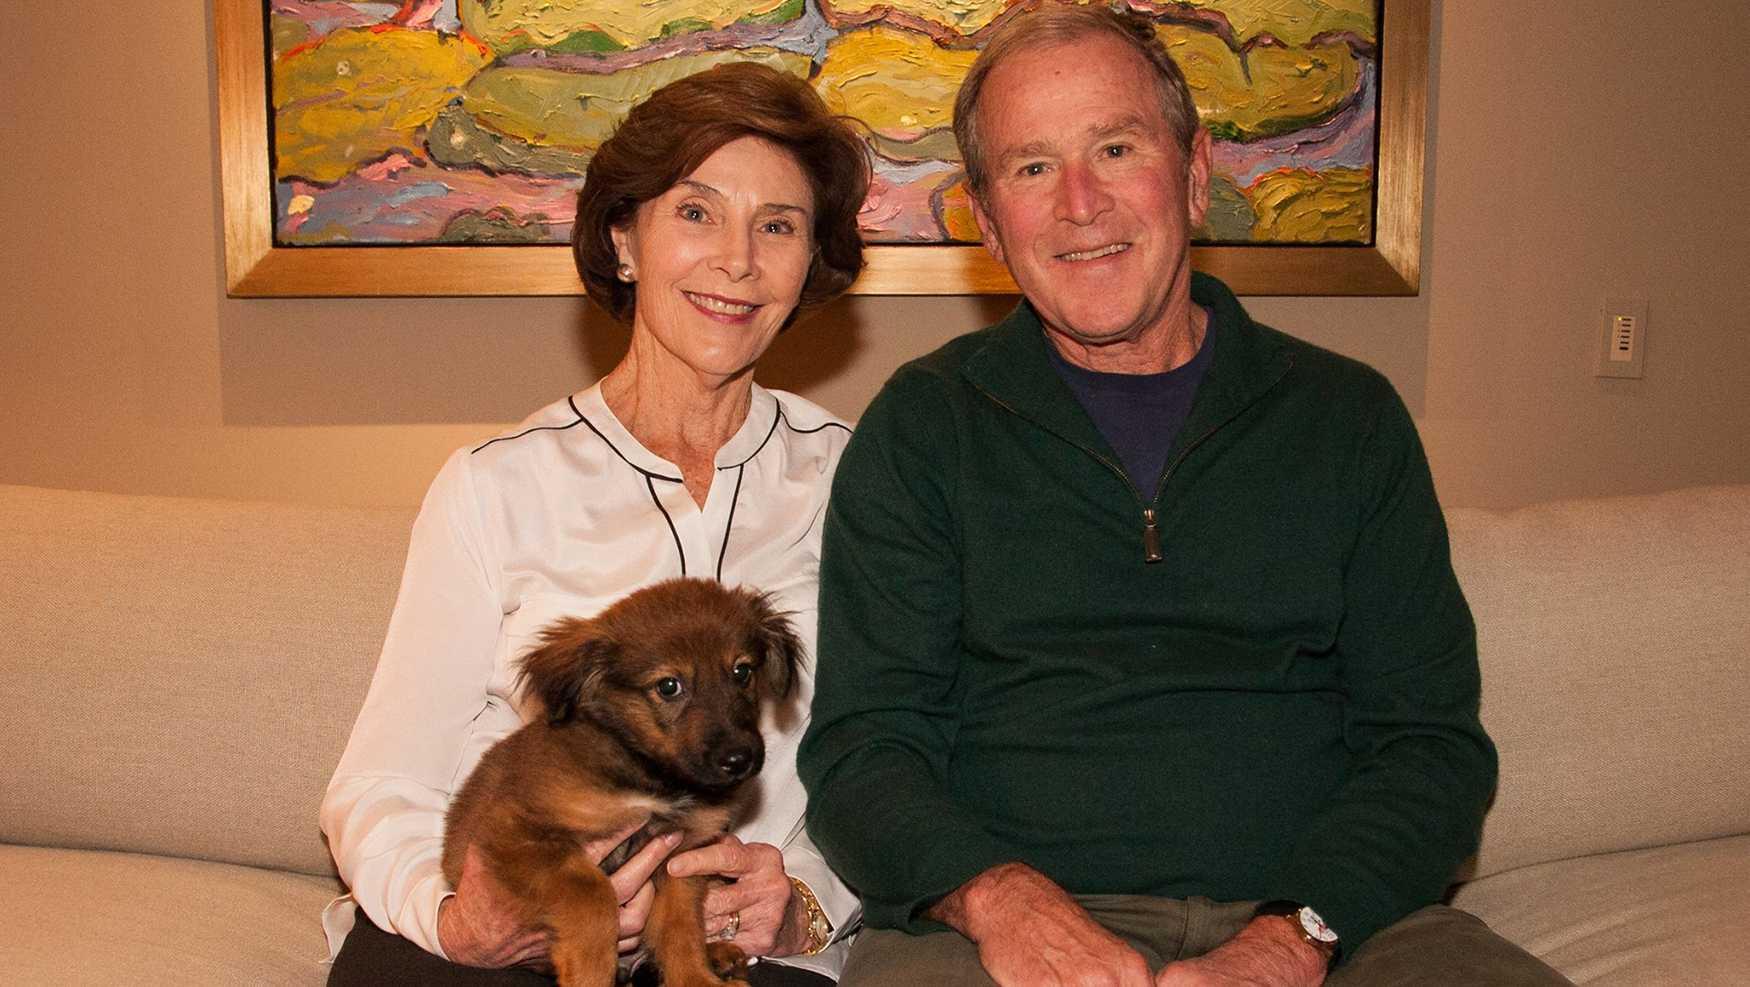 George W. Bush's new puppy